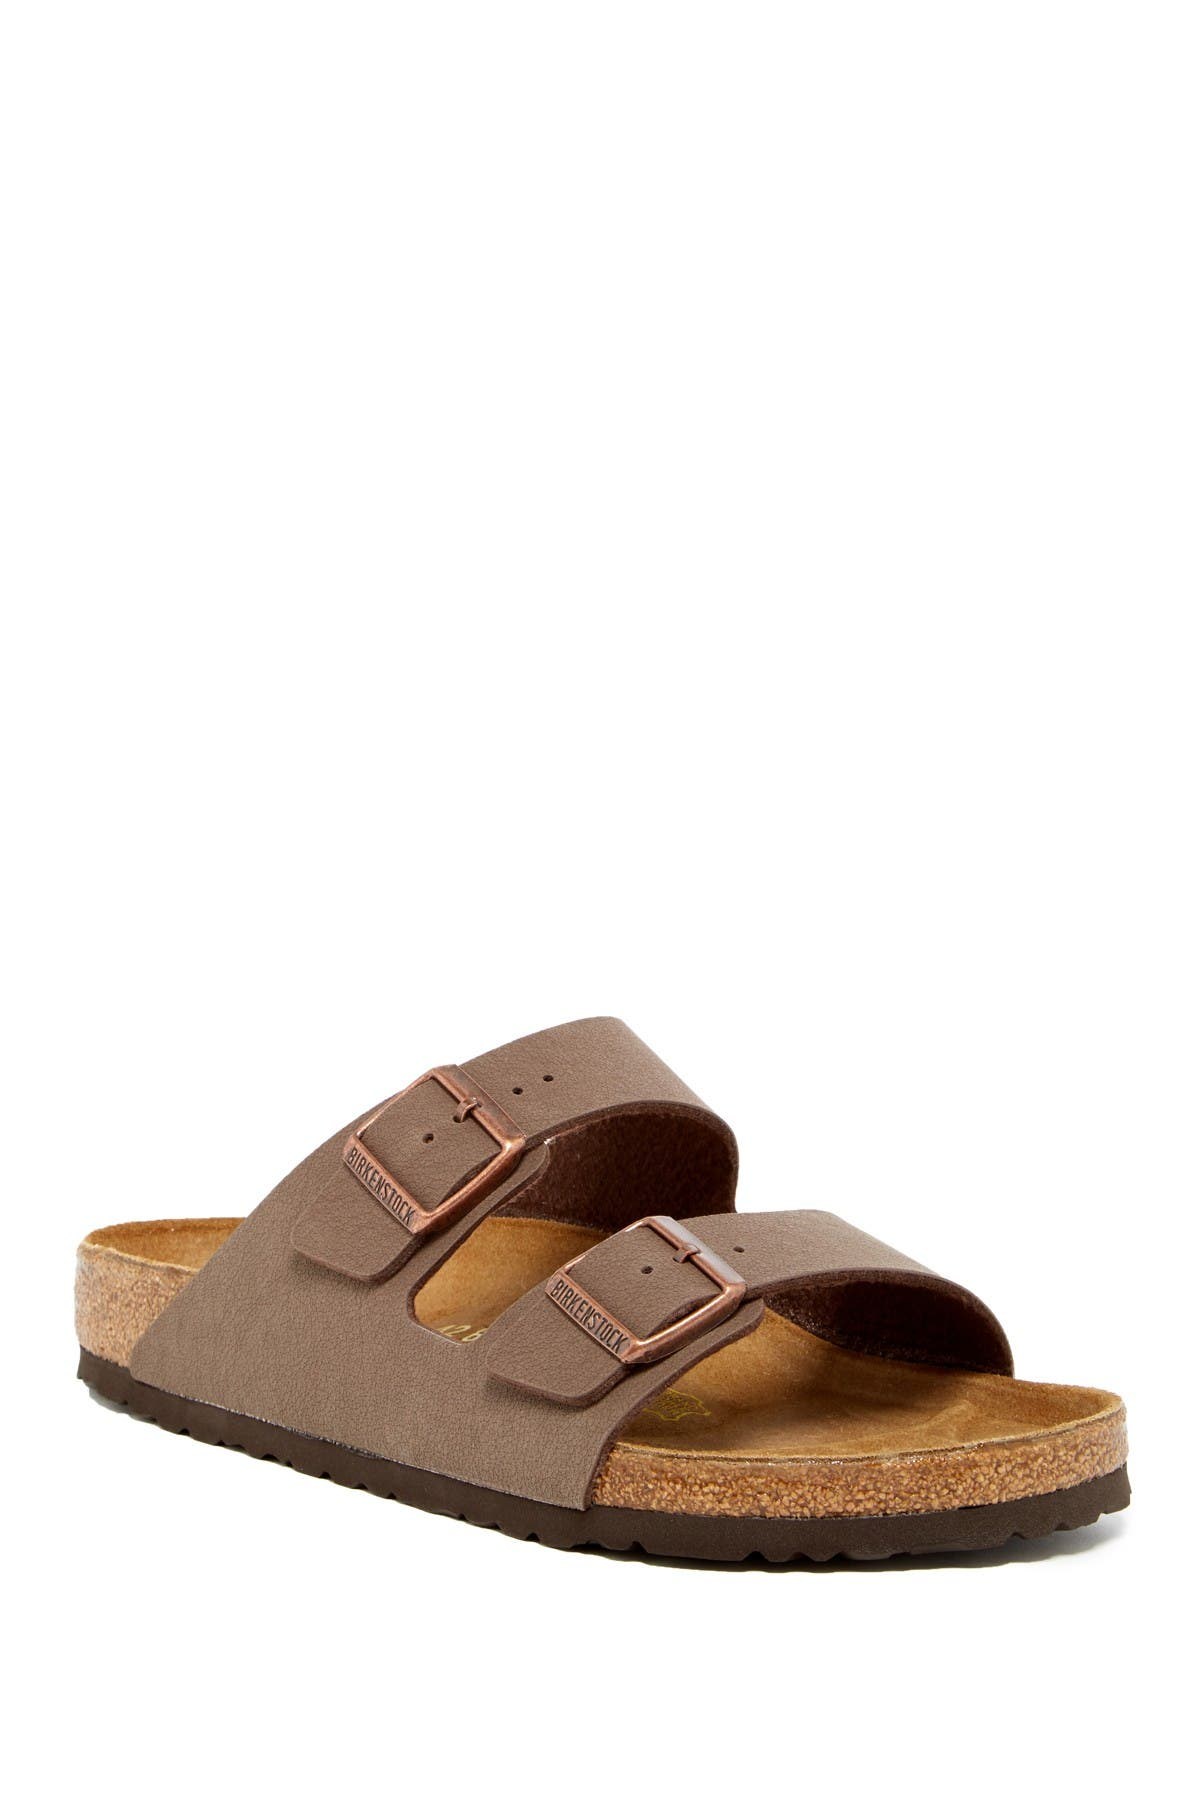 Image of Birkenstock Arizona Classic Footbed Sandal - Discontinued